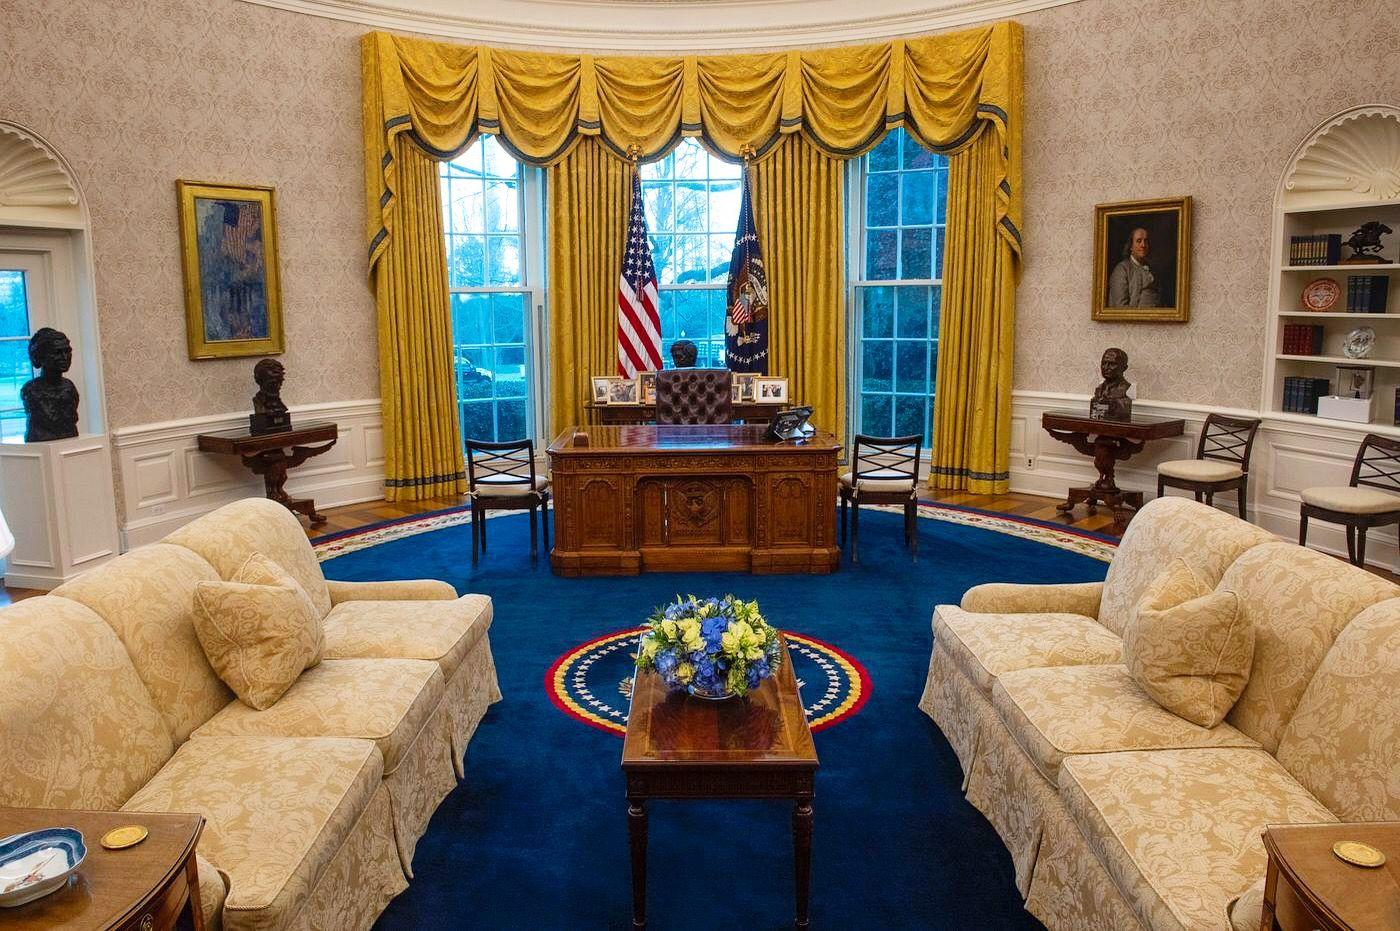 A First Look at President Joe Biden's Oval Office